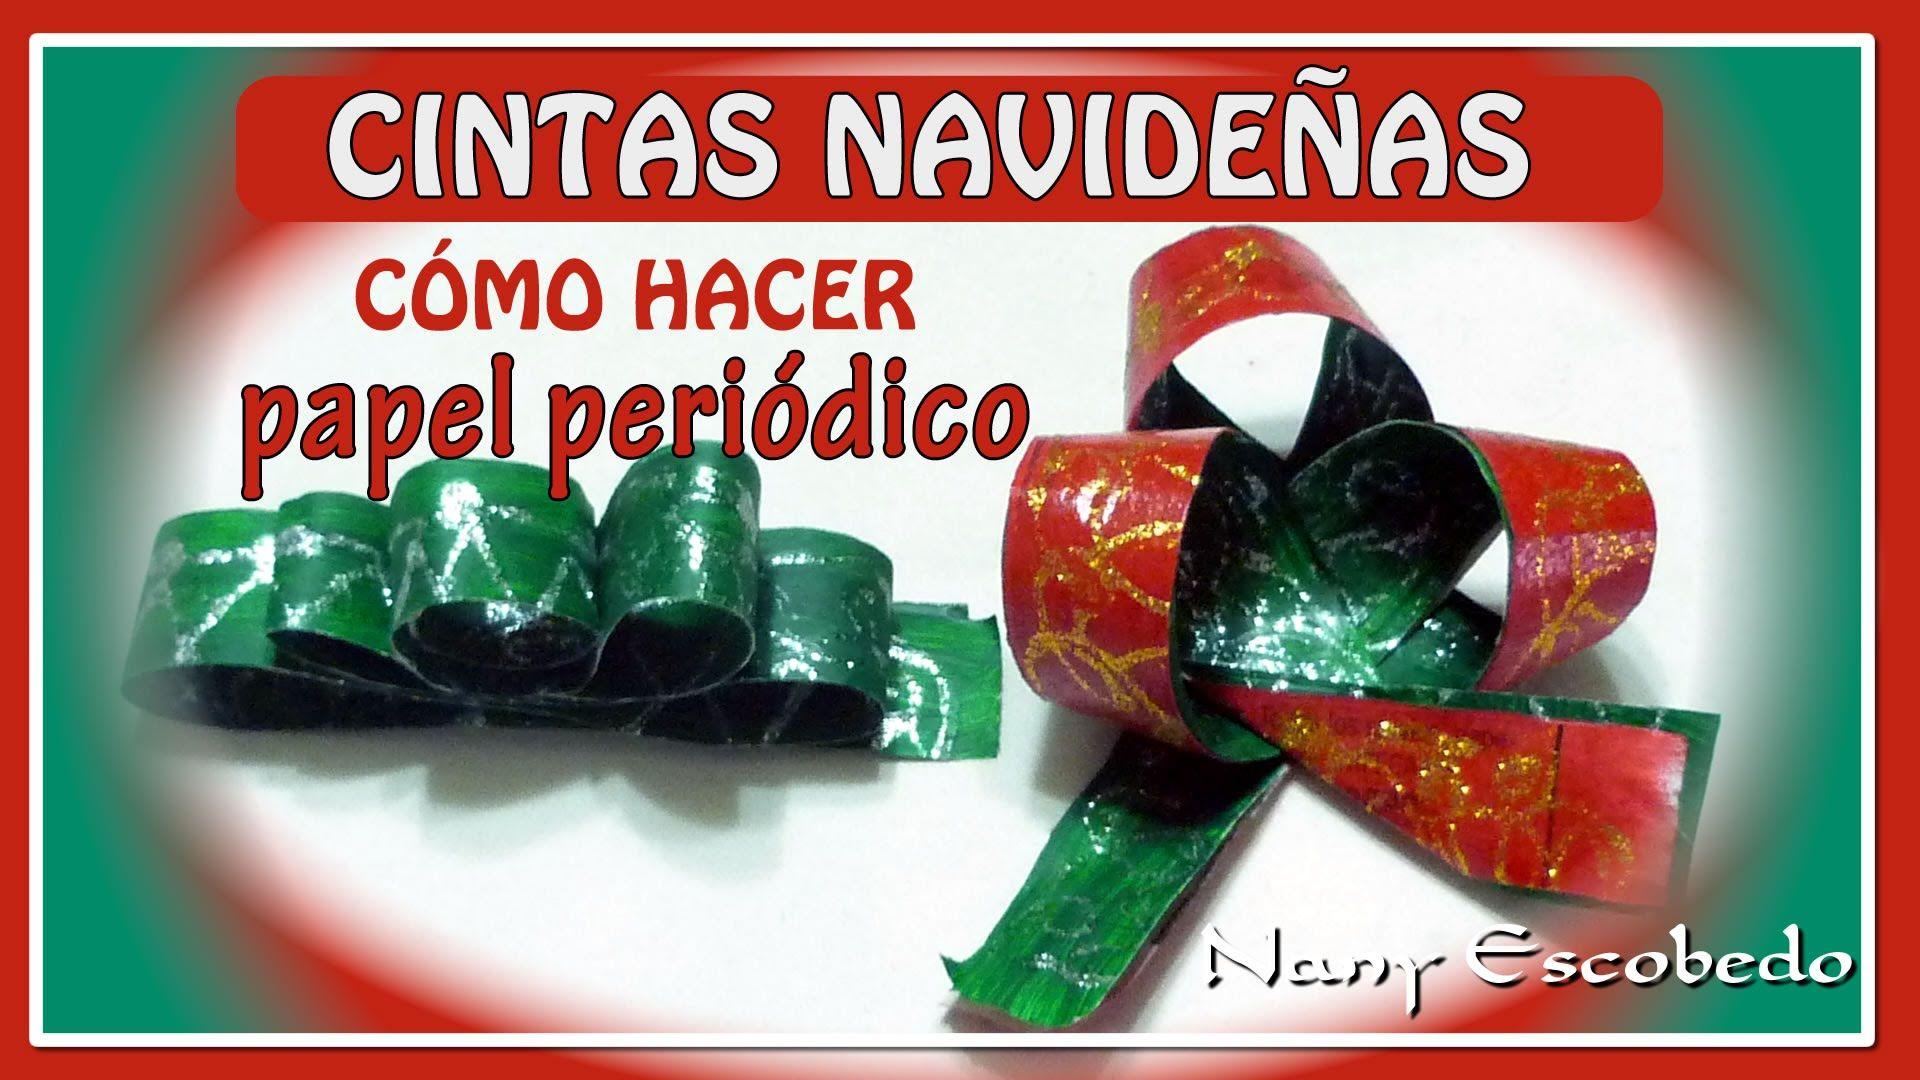 Cinta navide a con papel peri dico papel de periodico - Manualidades con papel navidenas ...